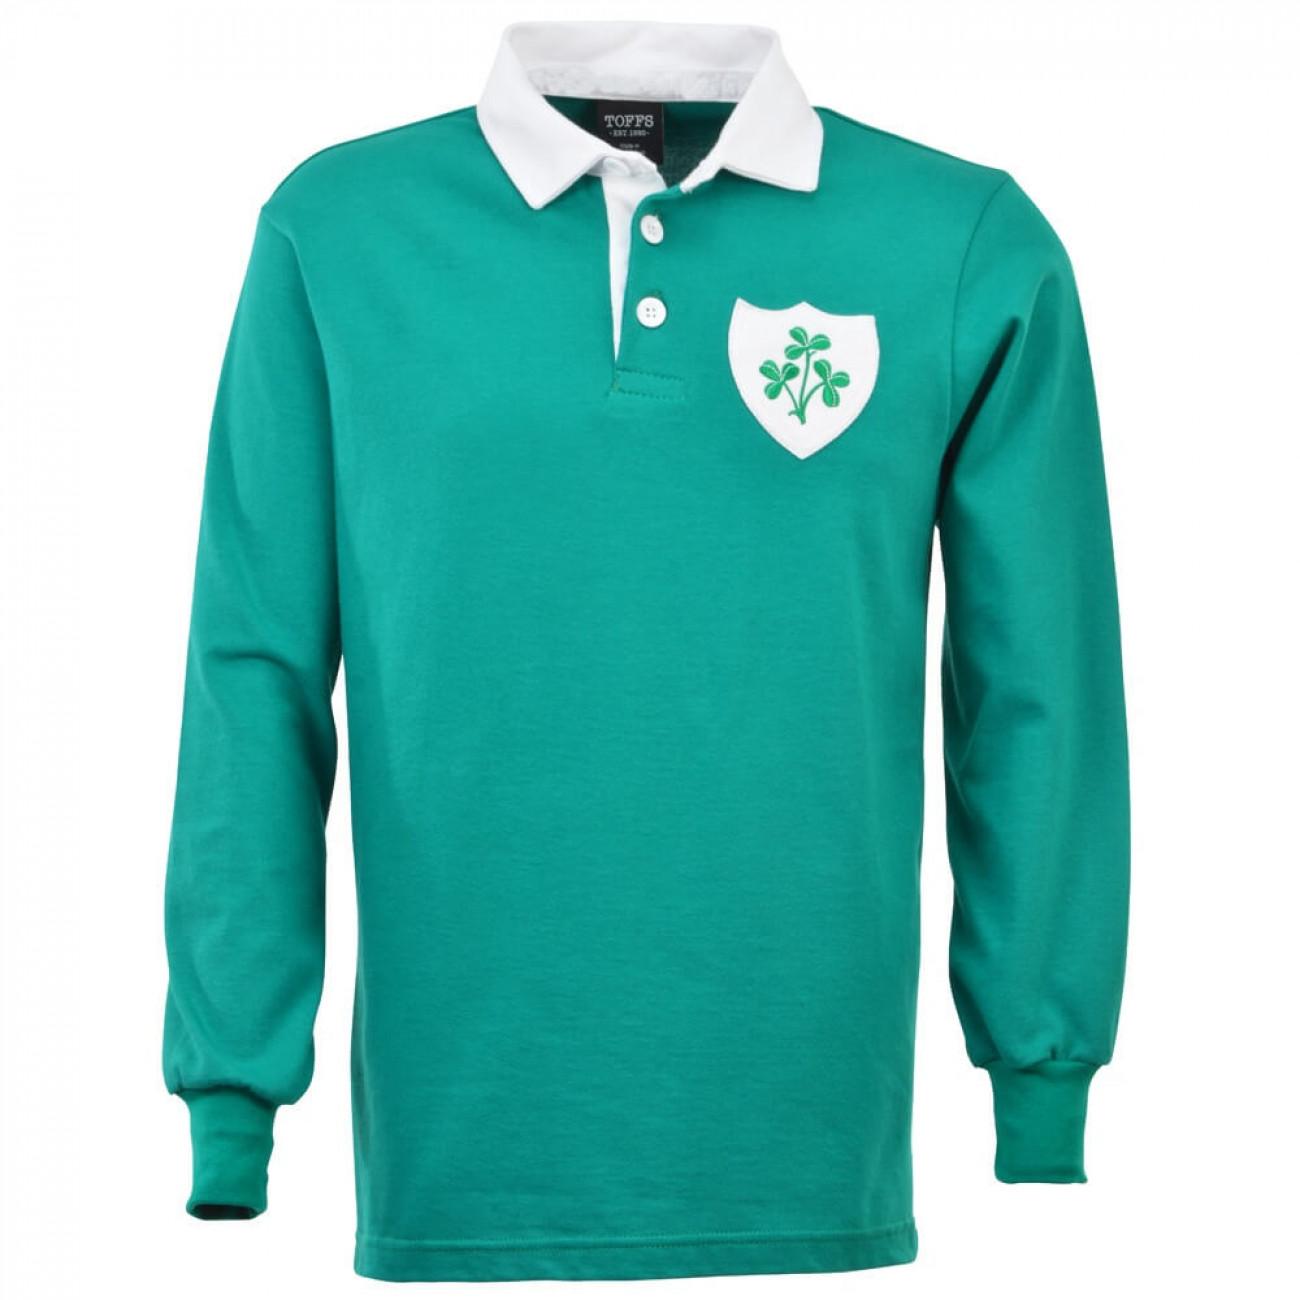 Polo de rugby rétro d'Irlande